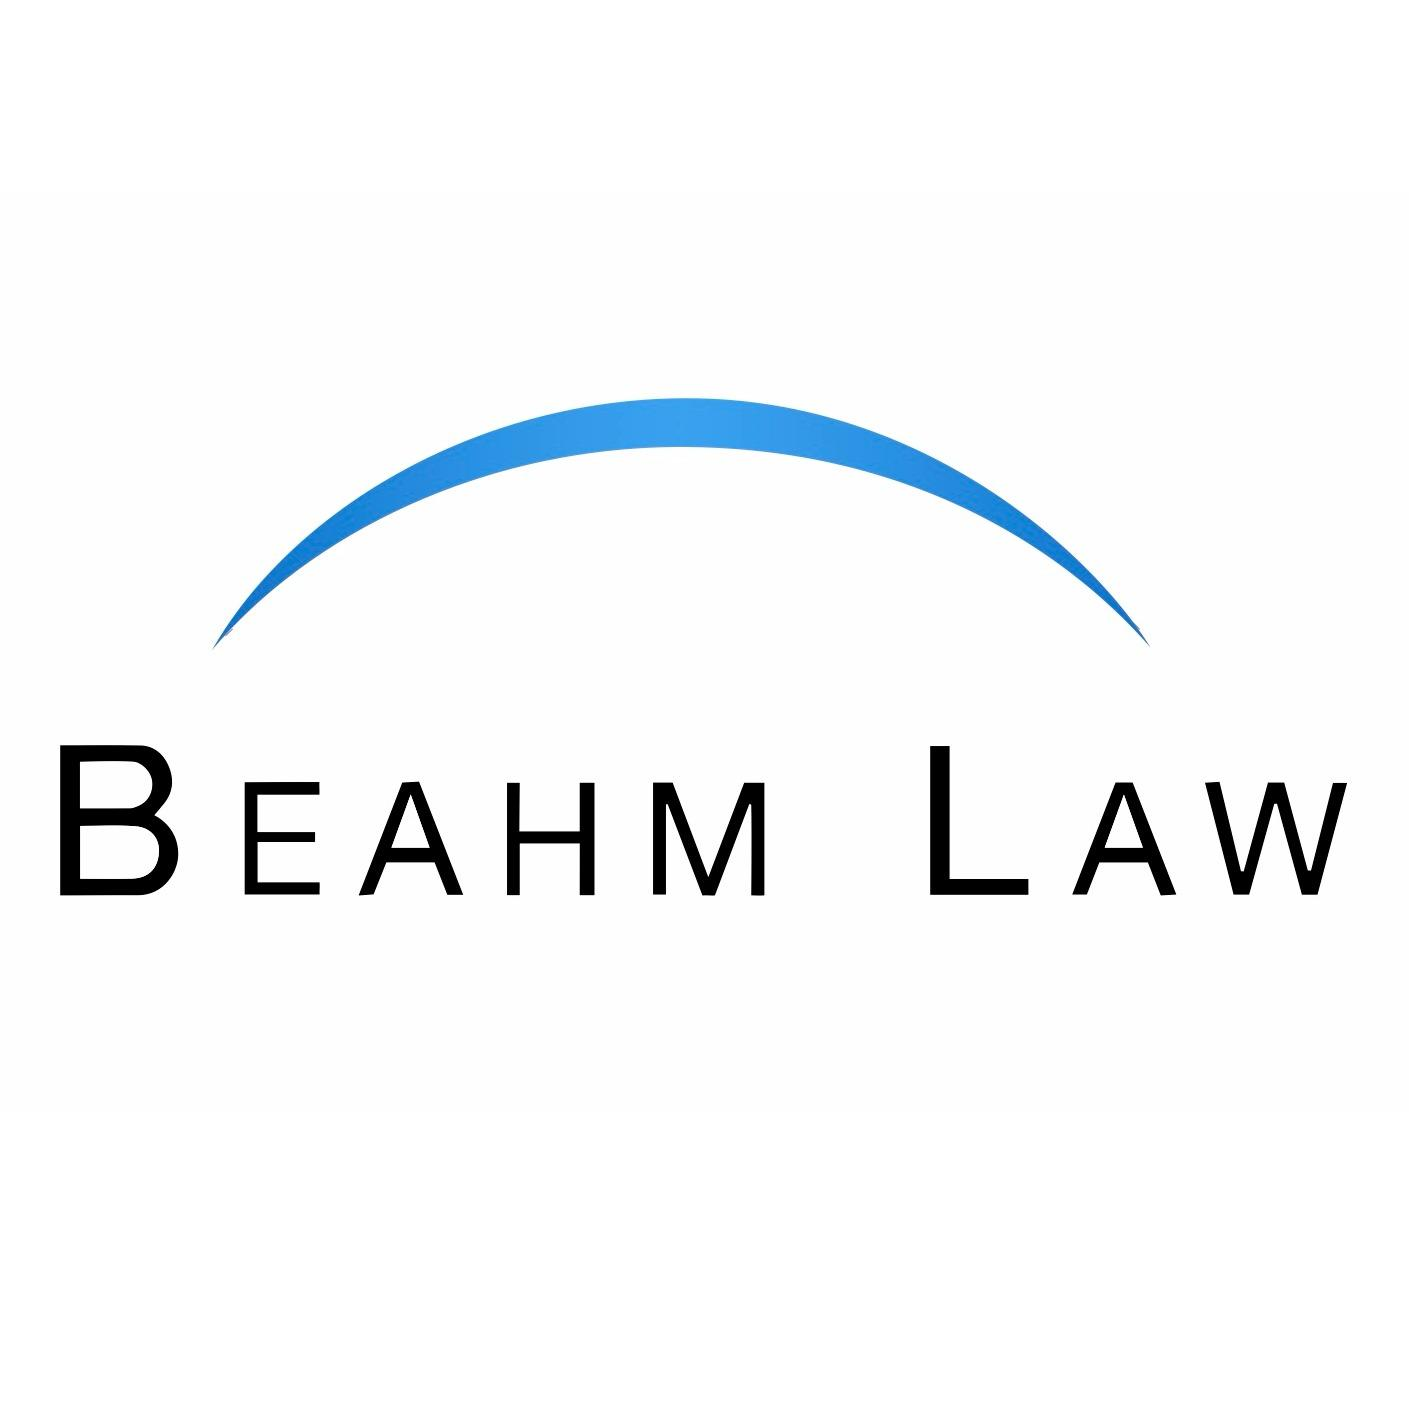 Beahm Law